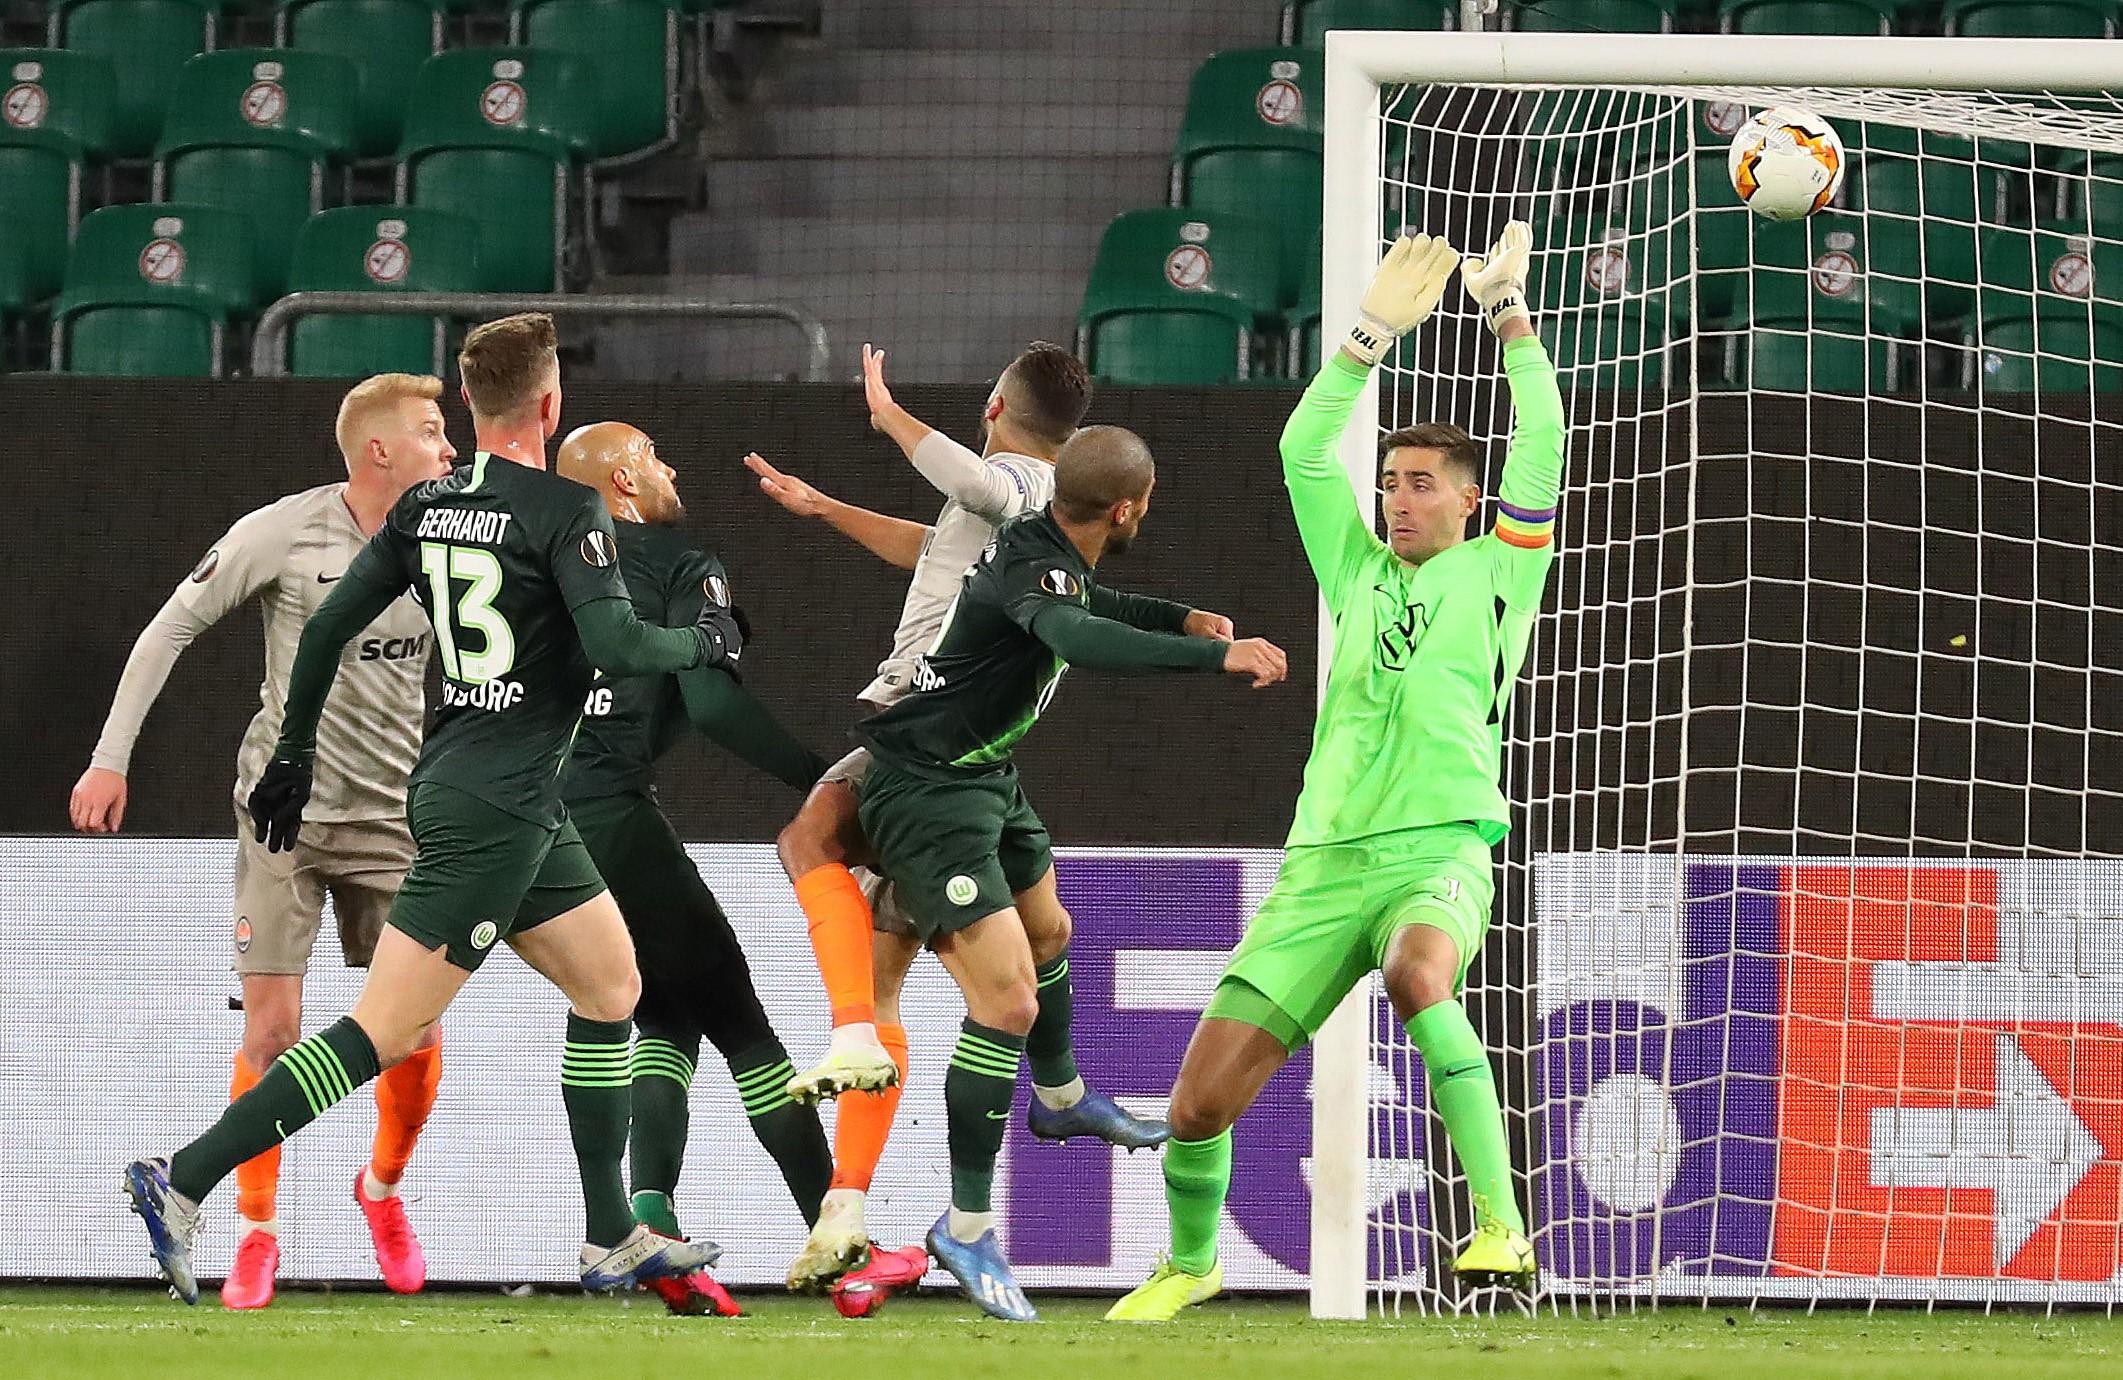 Le match Wolfsburg - Donetsk